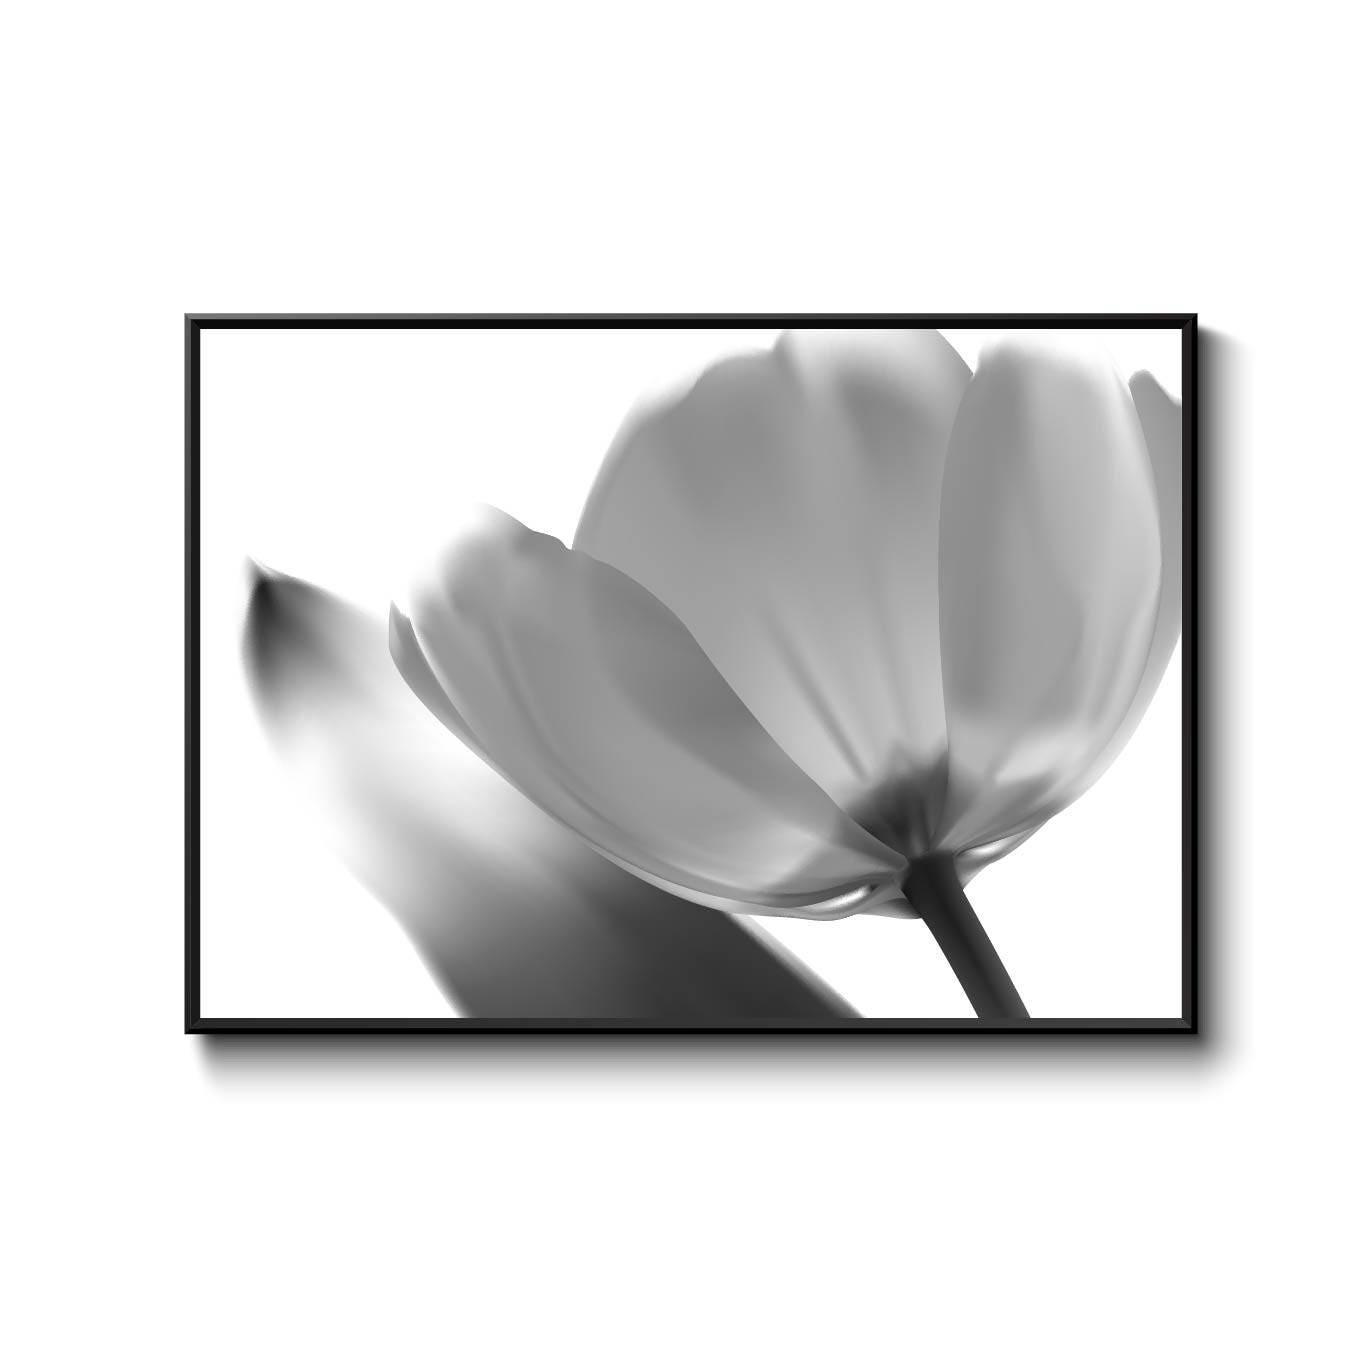 Black And White Flower Poster For Living Room Office Design Home